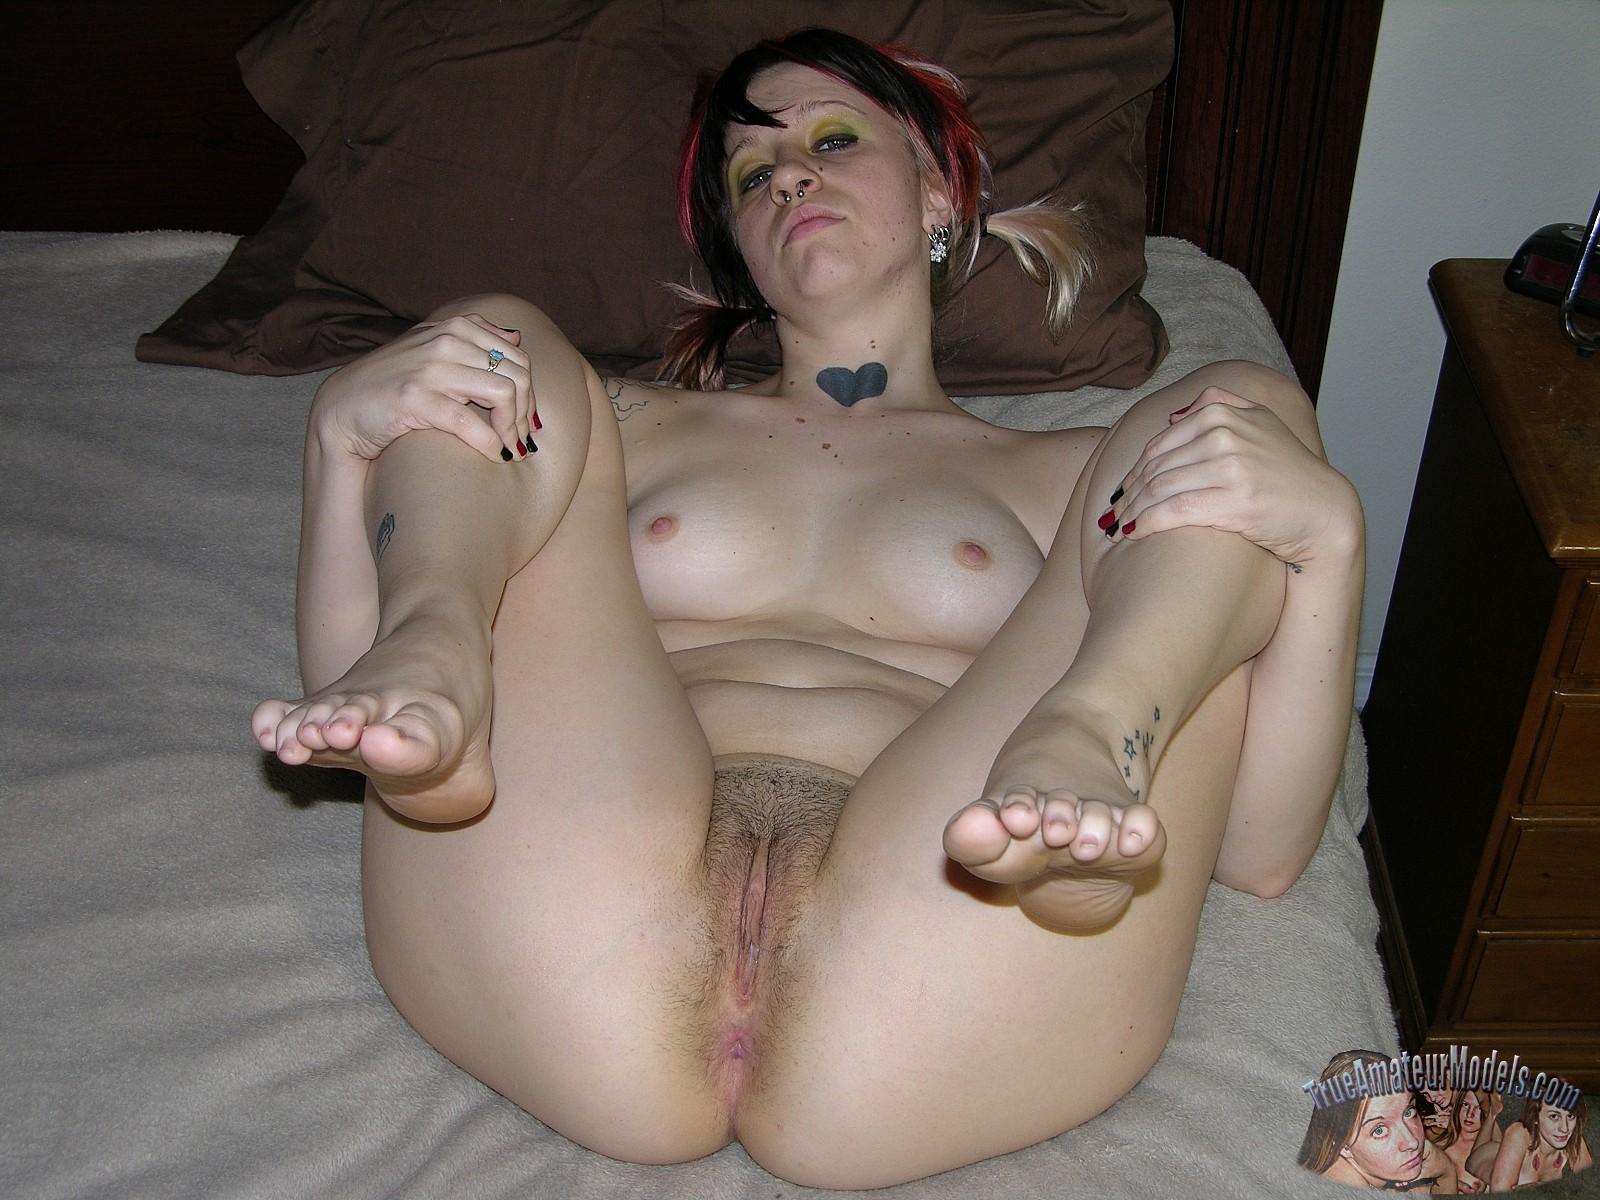 Nude girl death pics porn comic